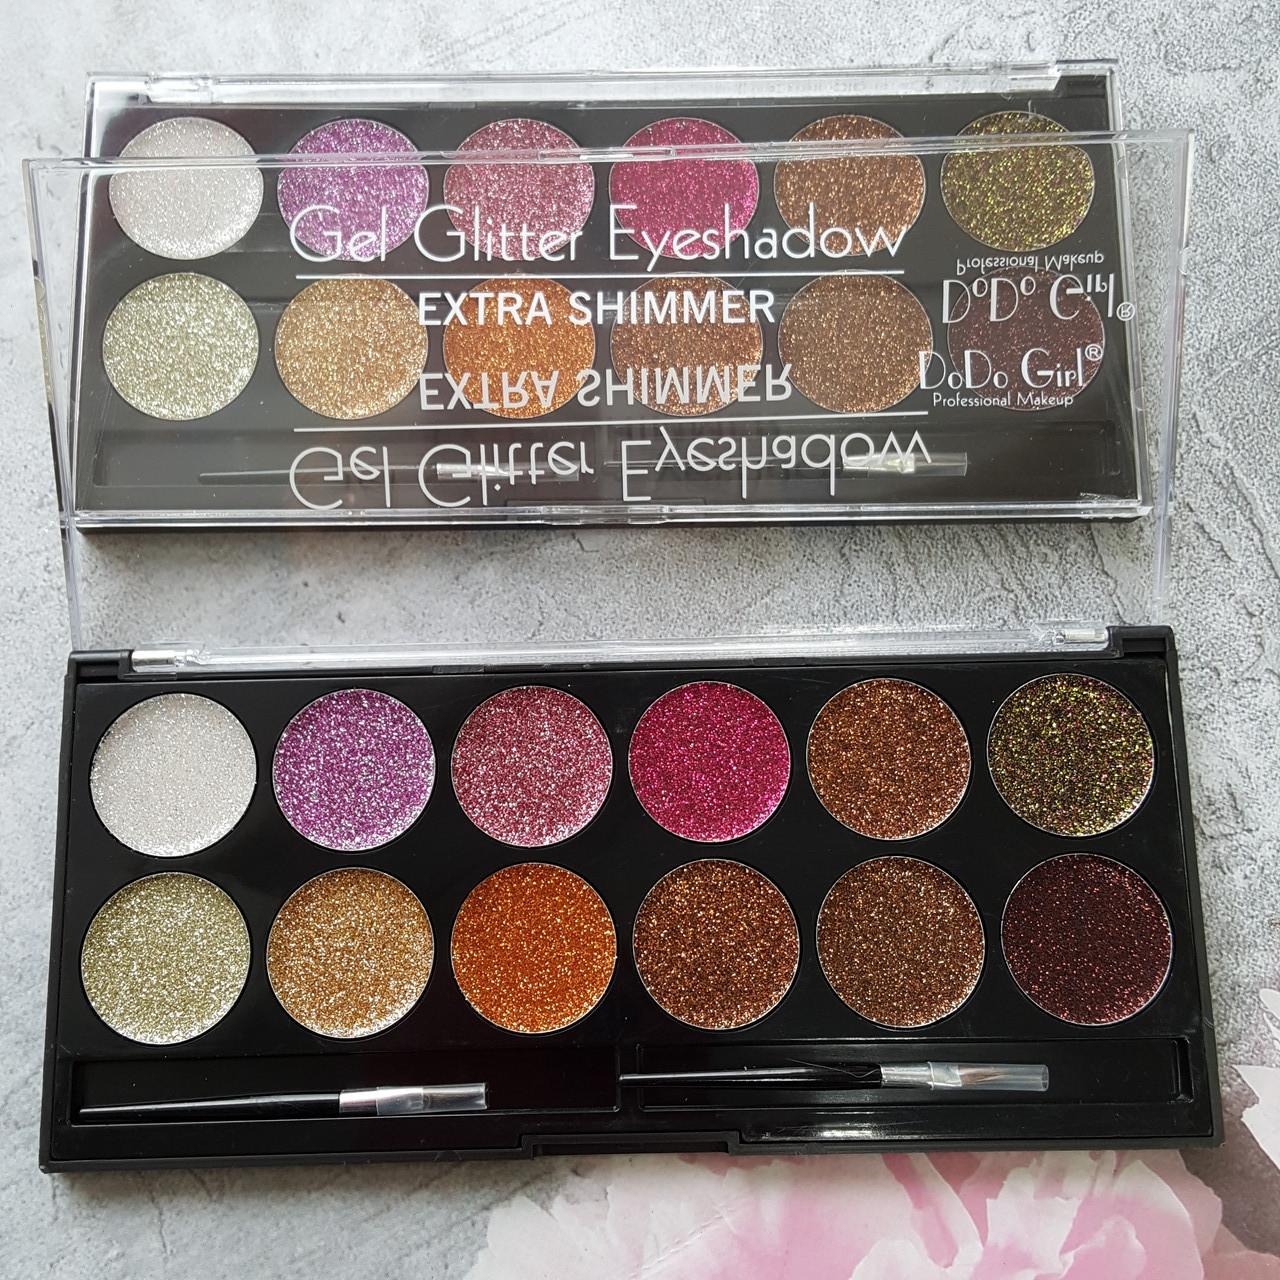 Палитра из 12 оттенков Глиттеров Get glitter eyeshadow extra shimmer DoDo Girl